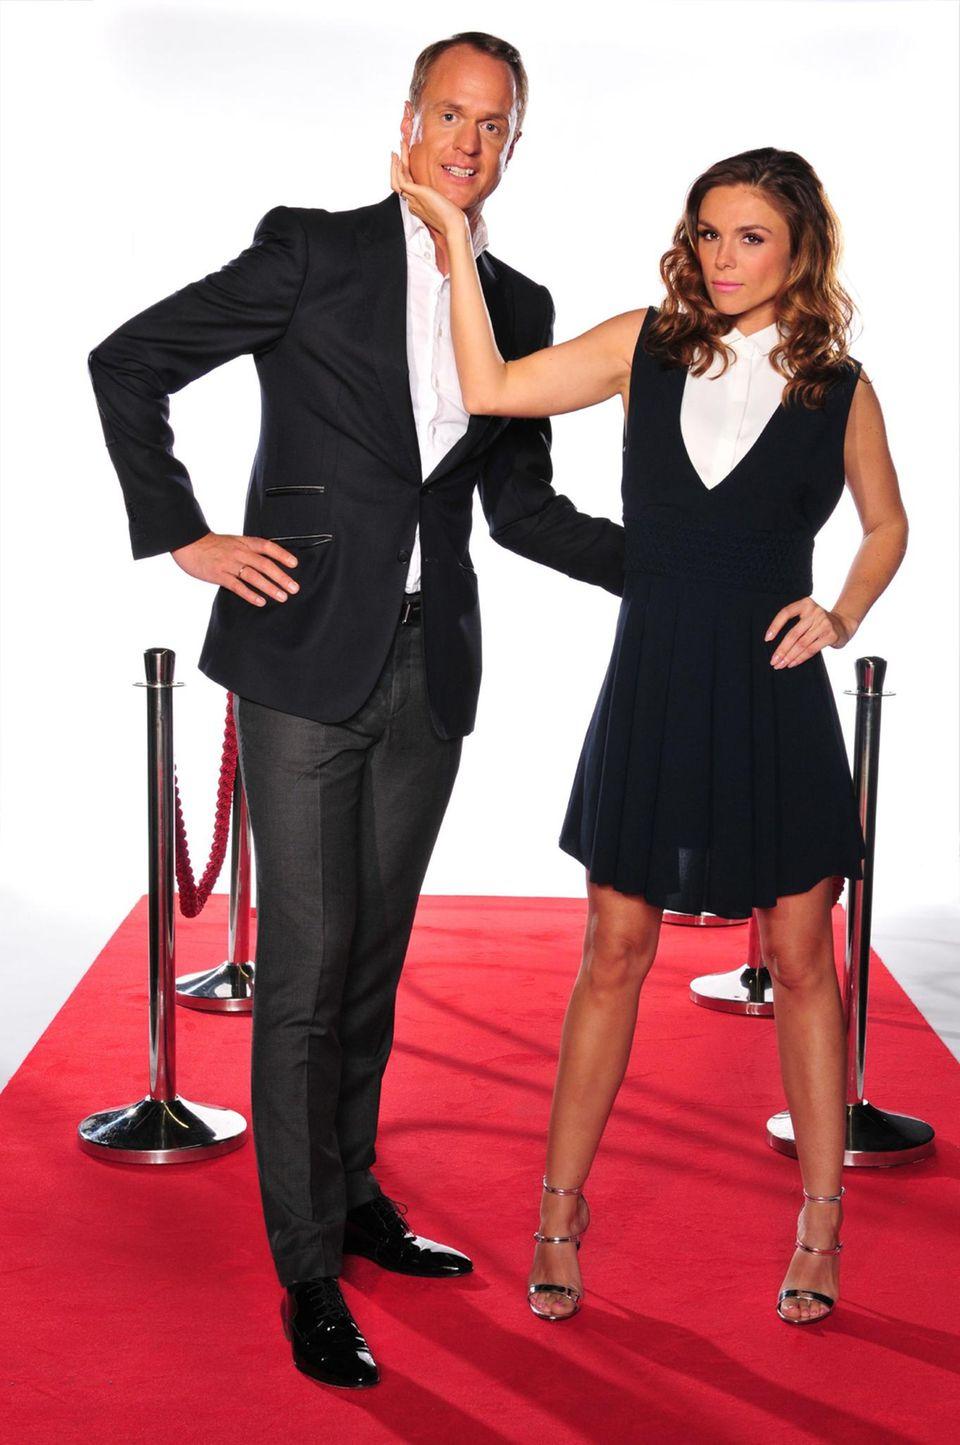 Alexander Posth und Angelina Ewerhardy